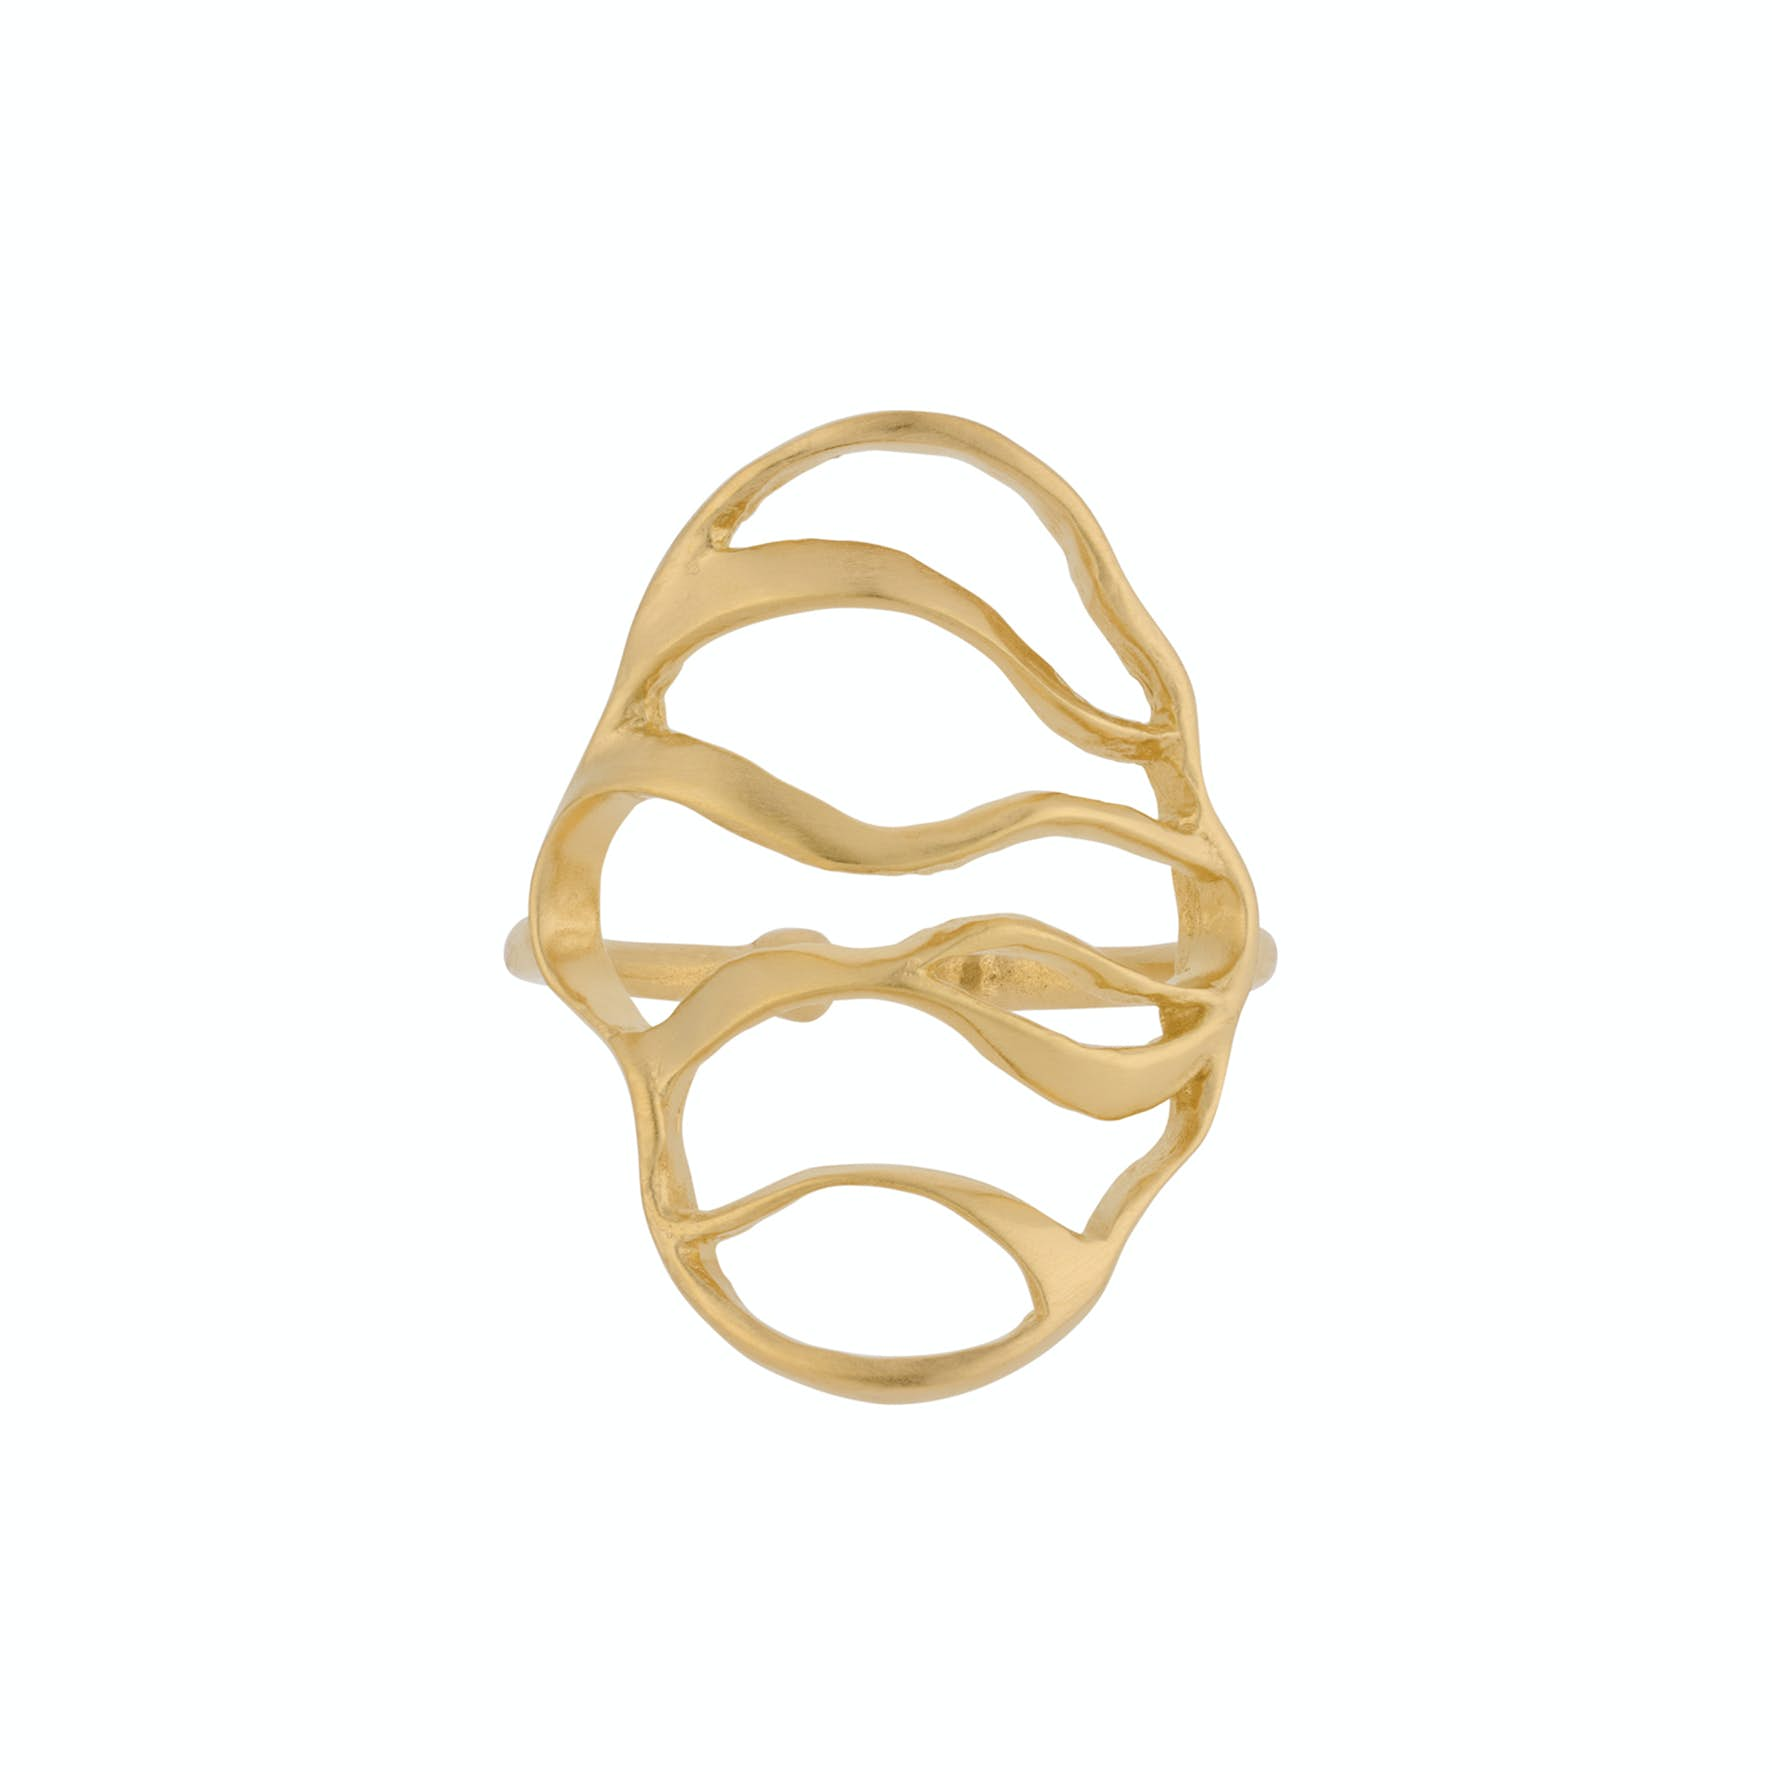 Wave Ring von Pernille Corydon in Vergoldet-Silber Sterling 925